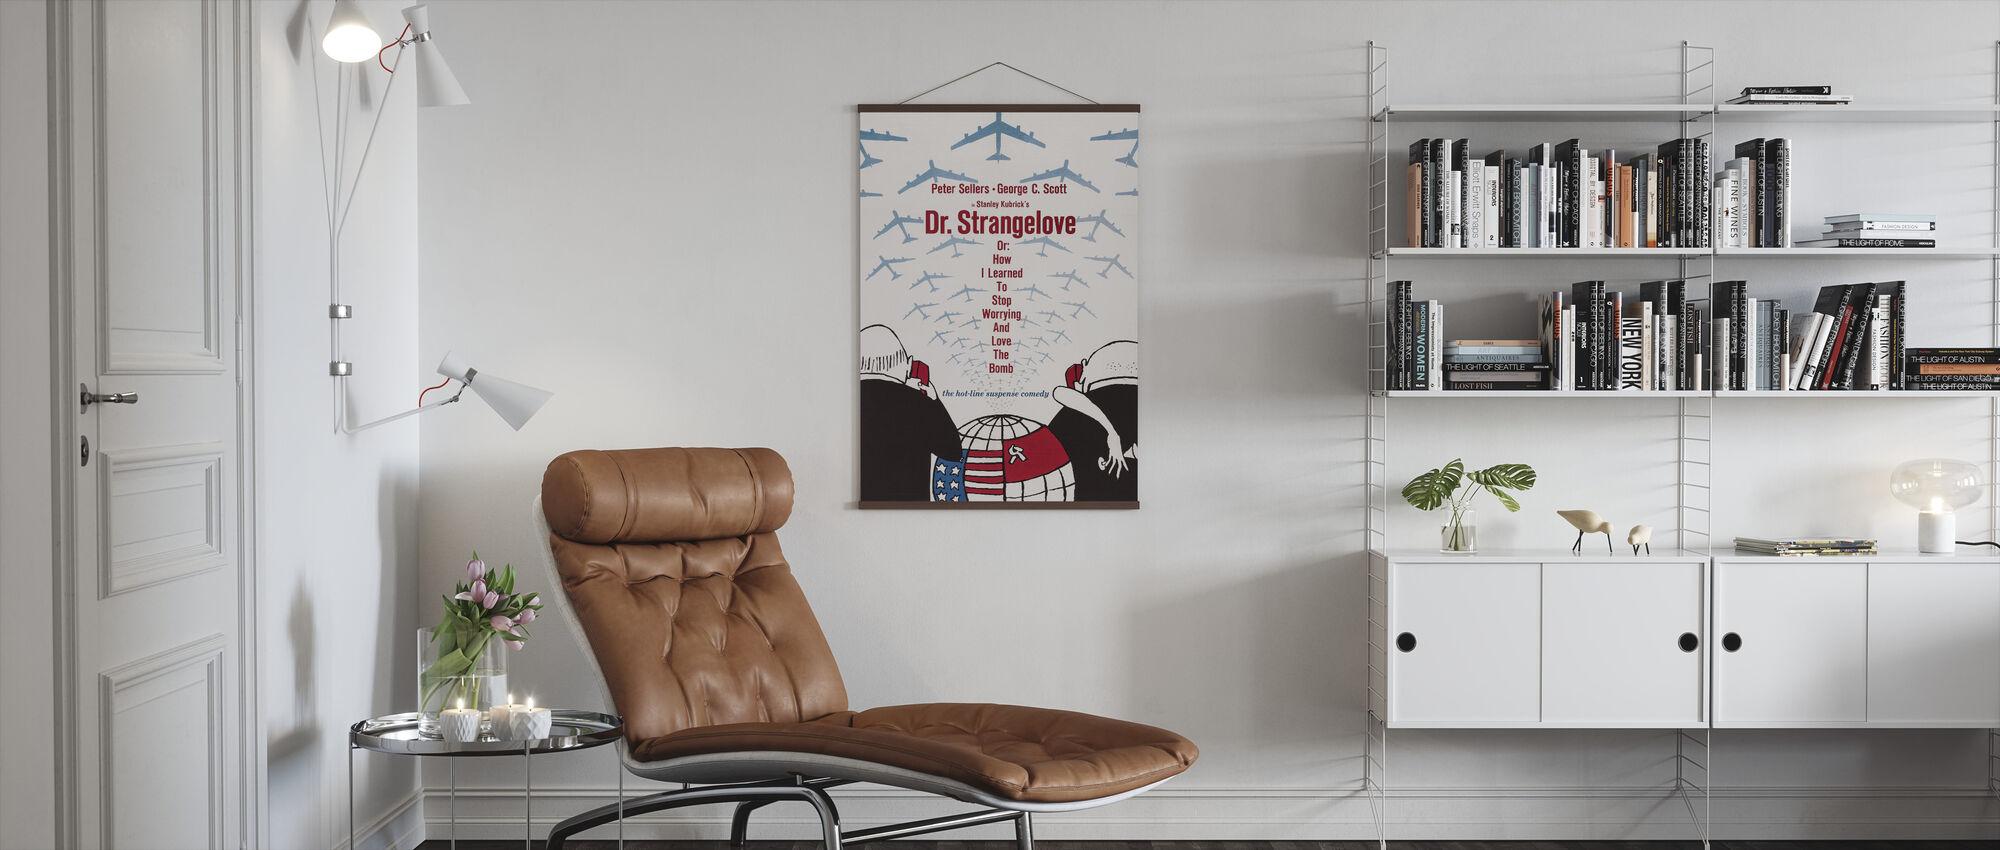 Dr. Strangelove - Poster - Living Room